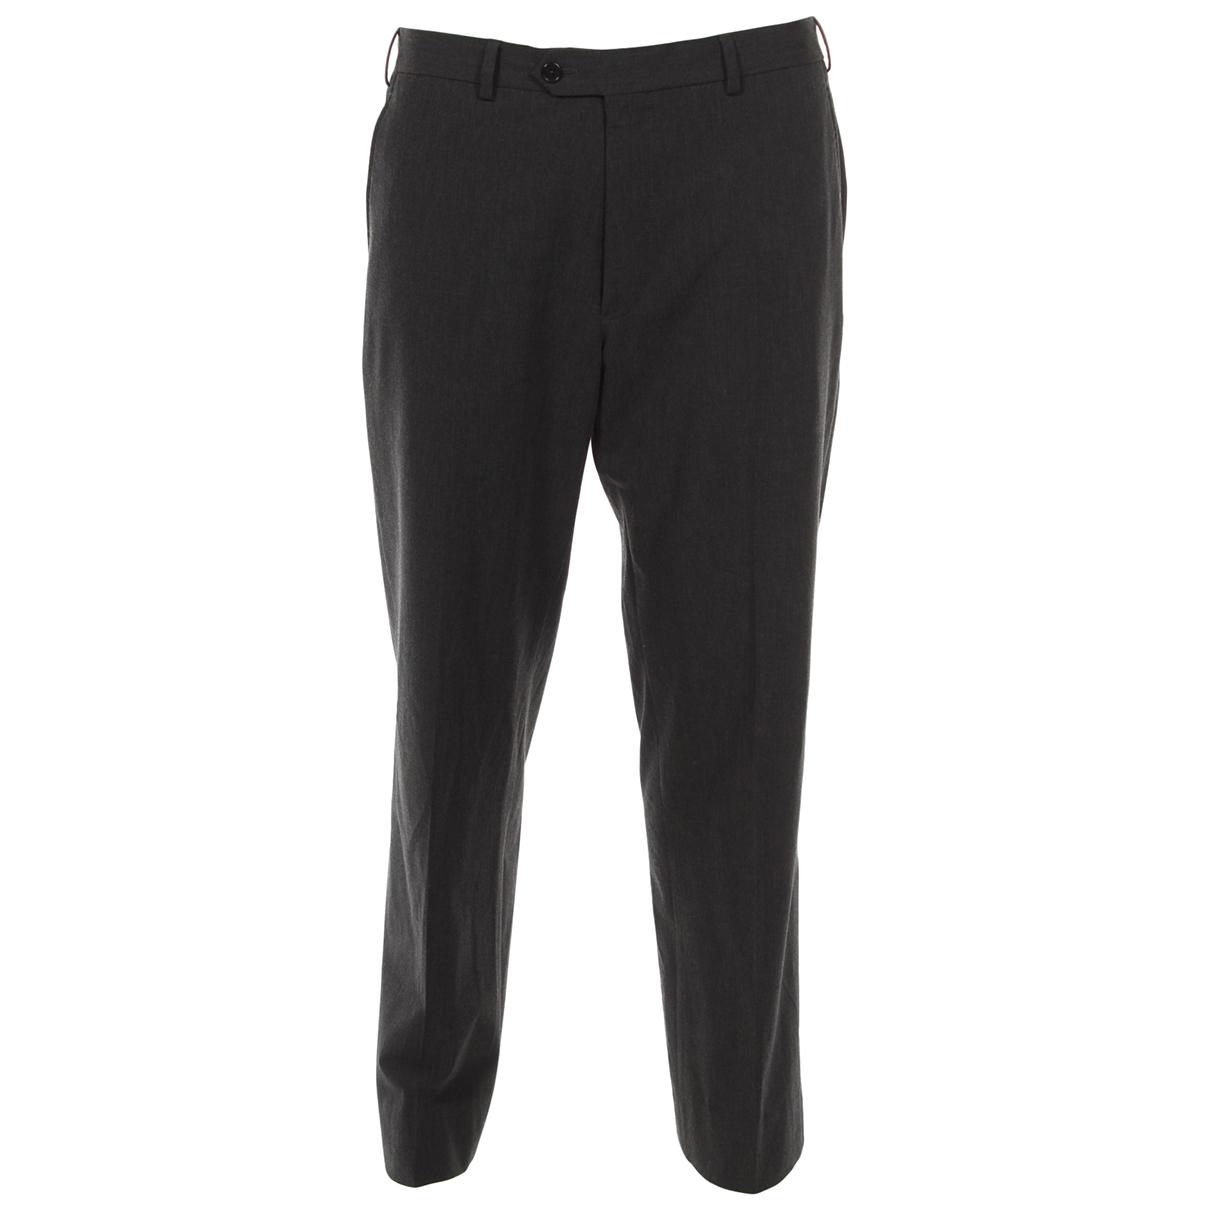 Armani Collezioni \N Grey Trousers for Men 36 UK - US